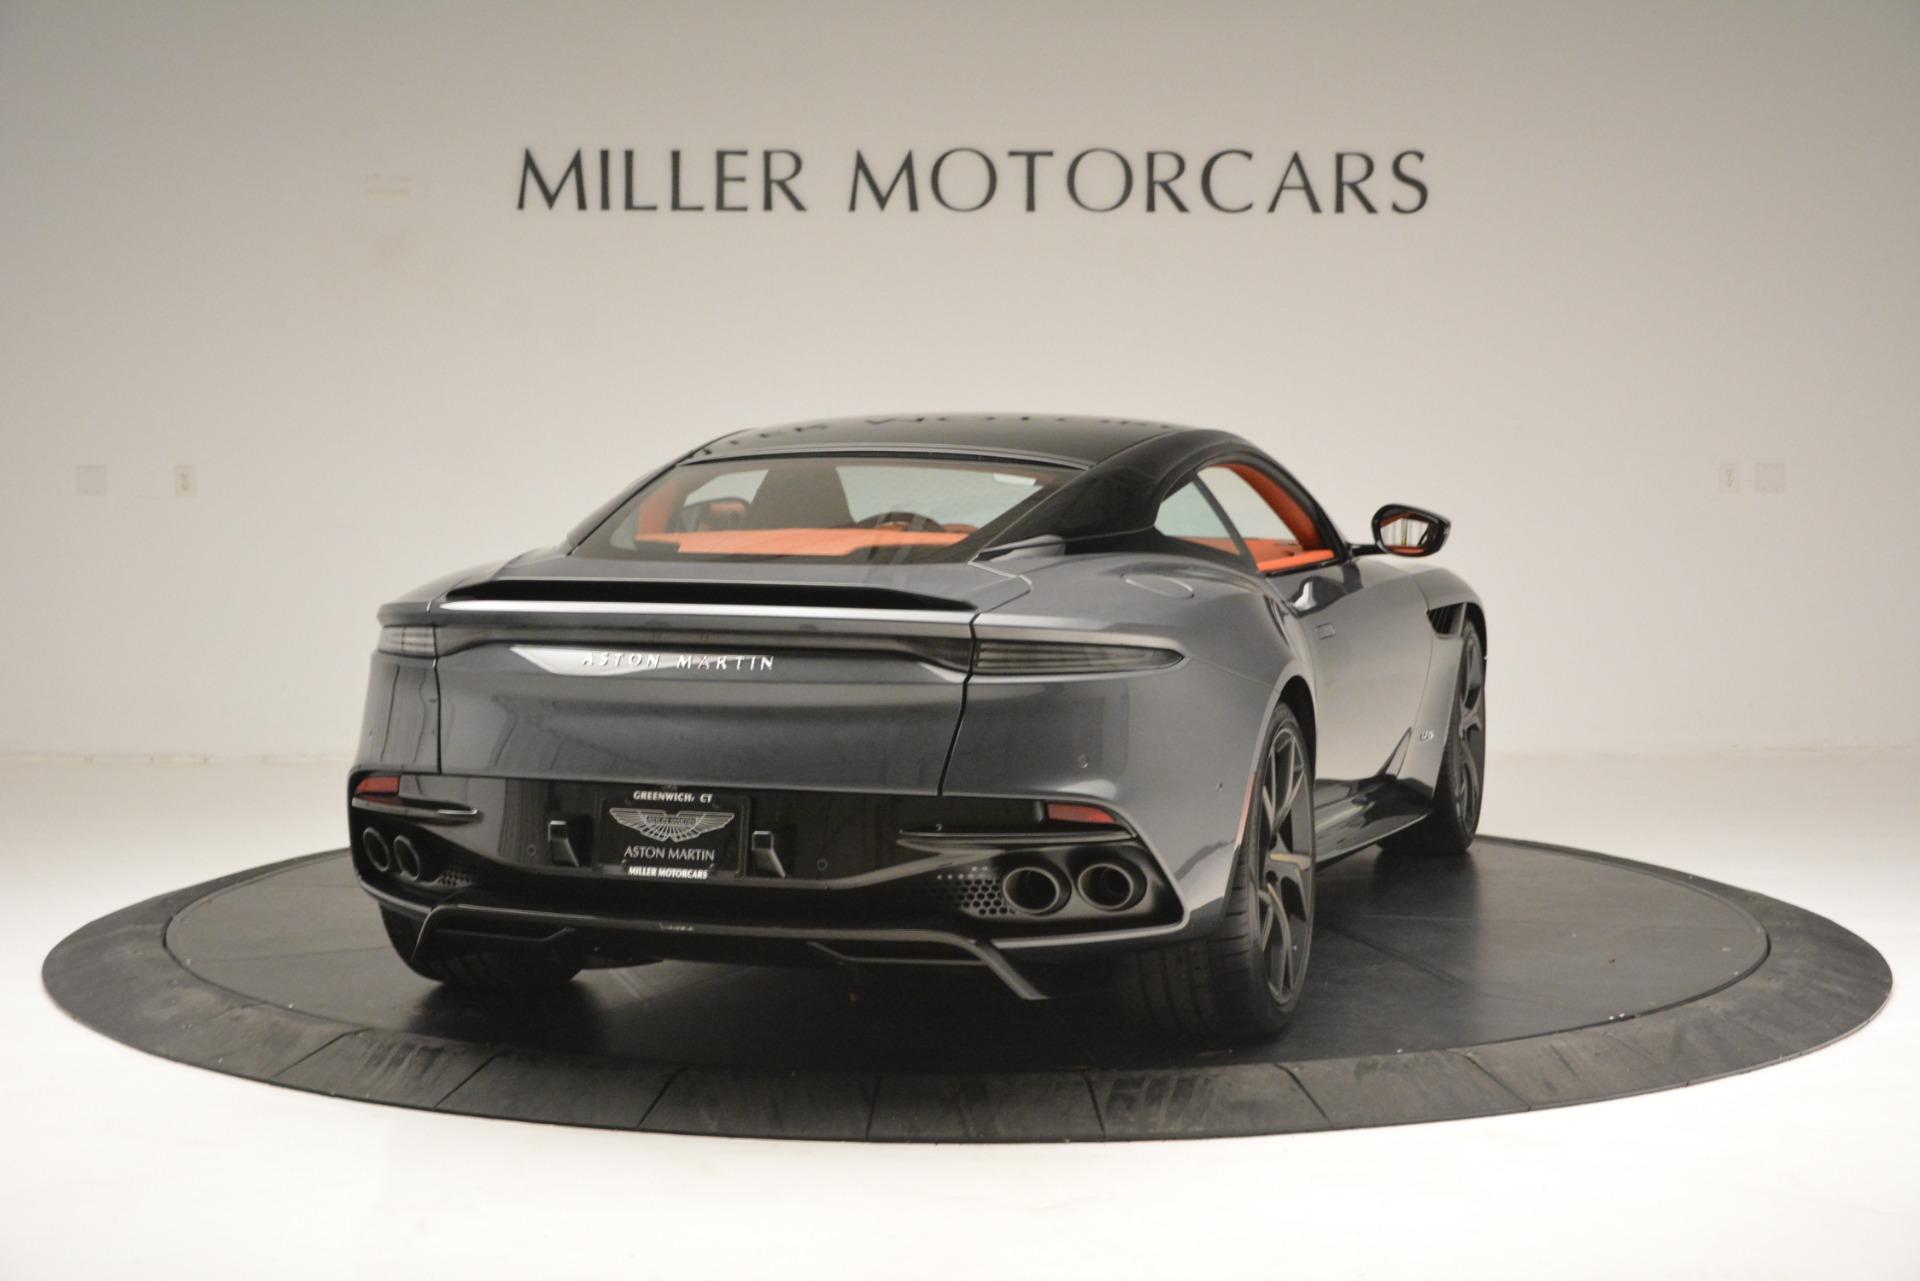 New 2019 Aston Martin DBS Superleggera For Sale In Greenwich, CT 2827_p7